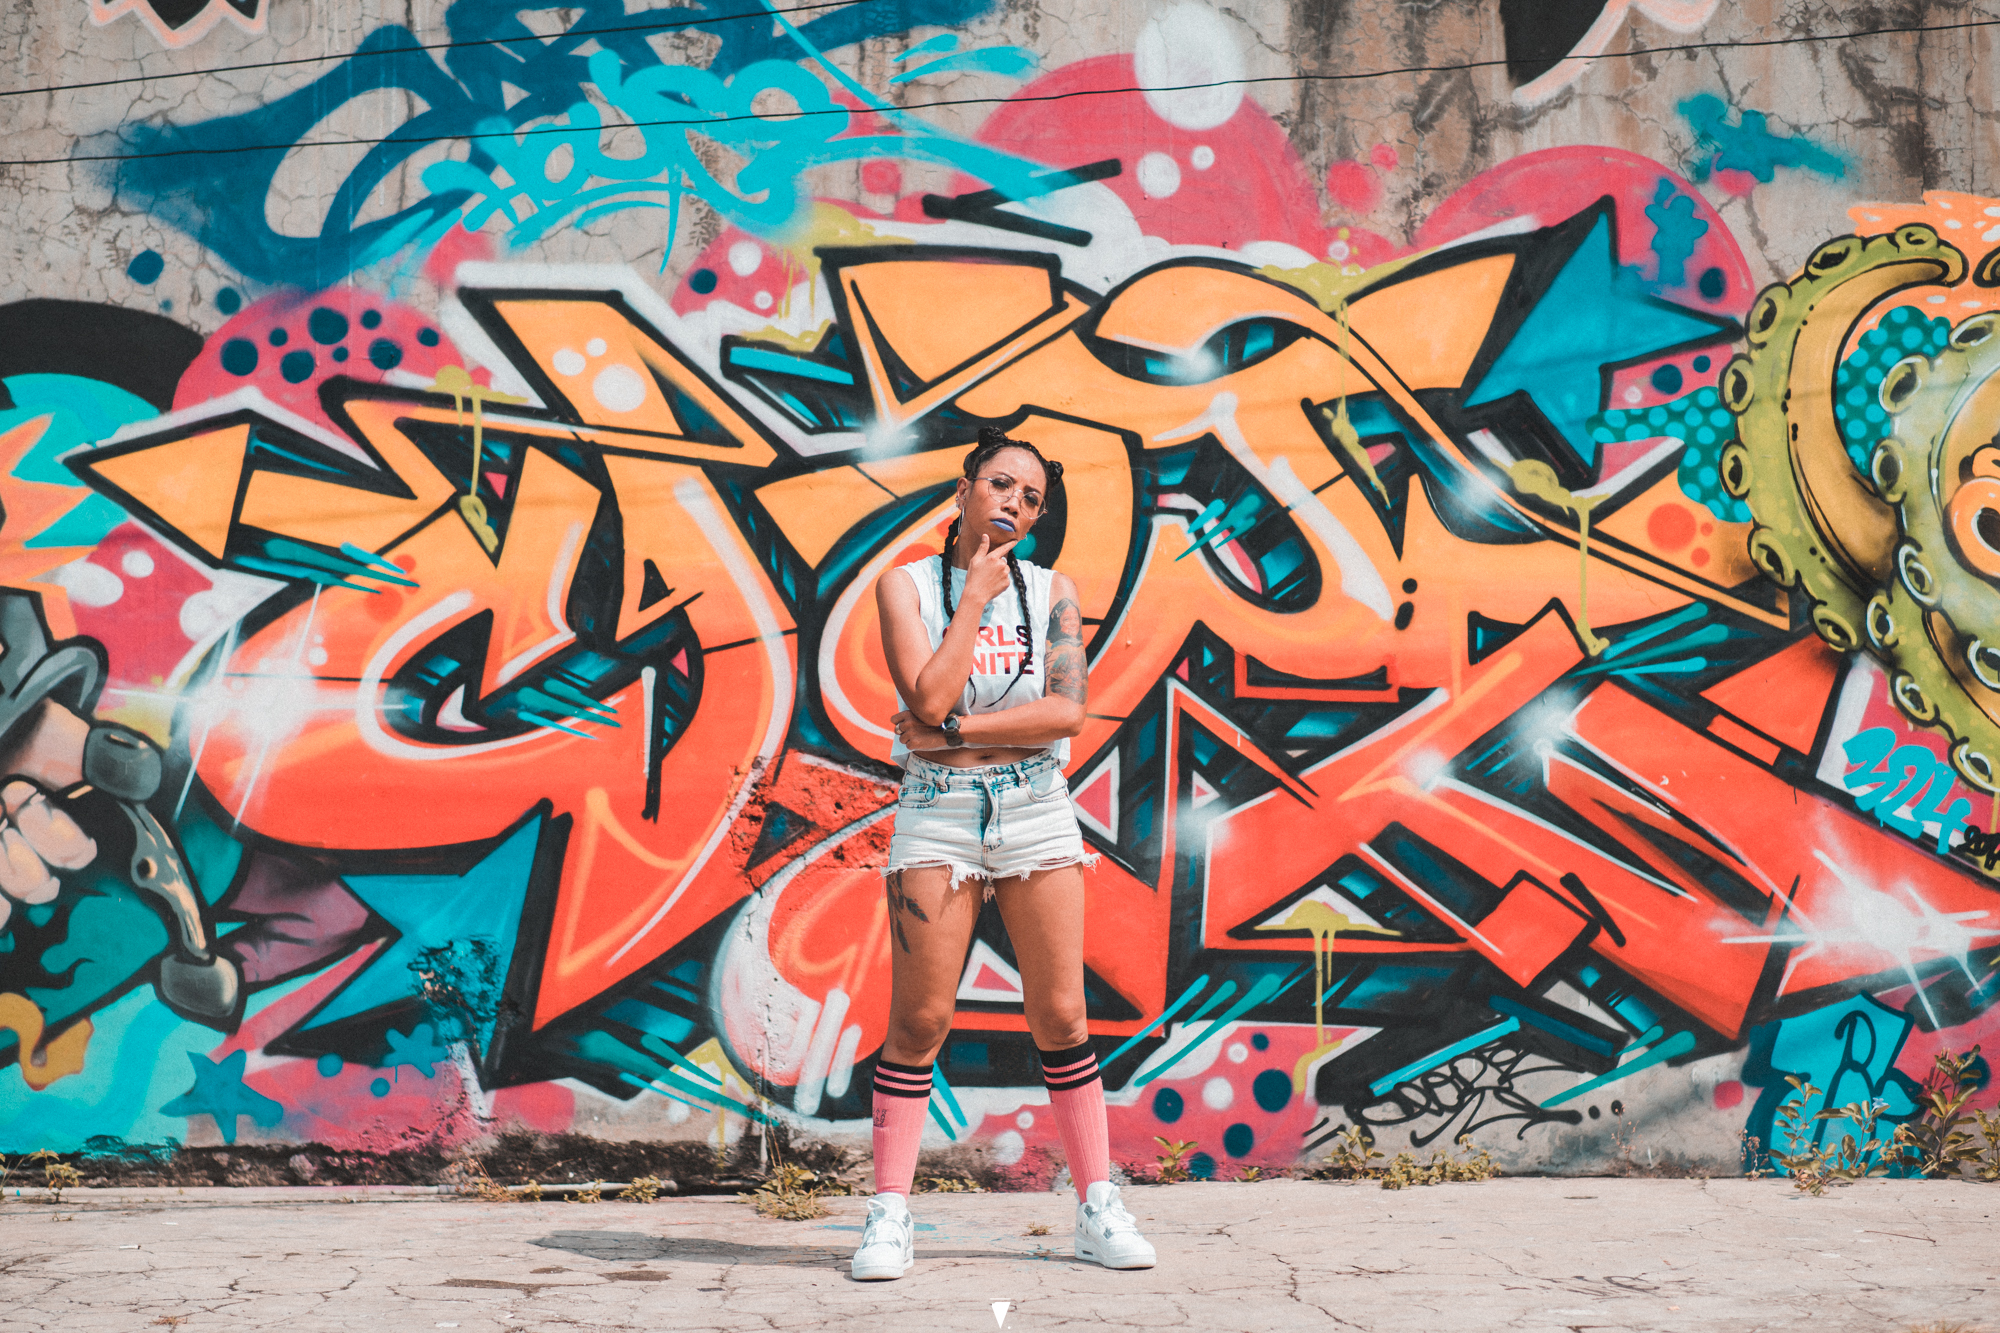 Mengenal Sosok Yacko: Rapper sekaligus dosen yang aktif menyuarakan hak perempuan